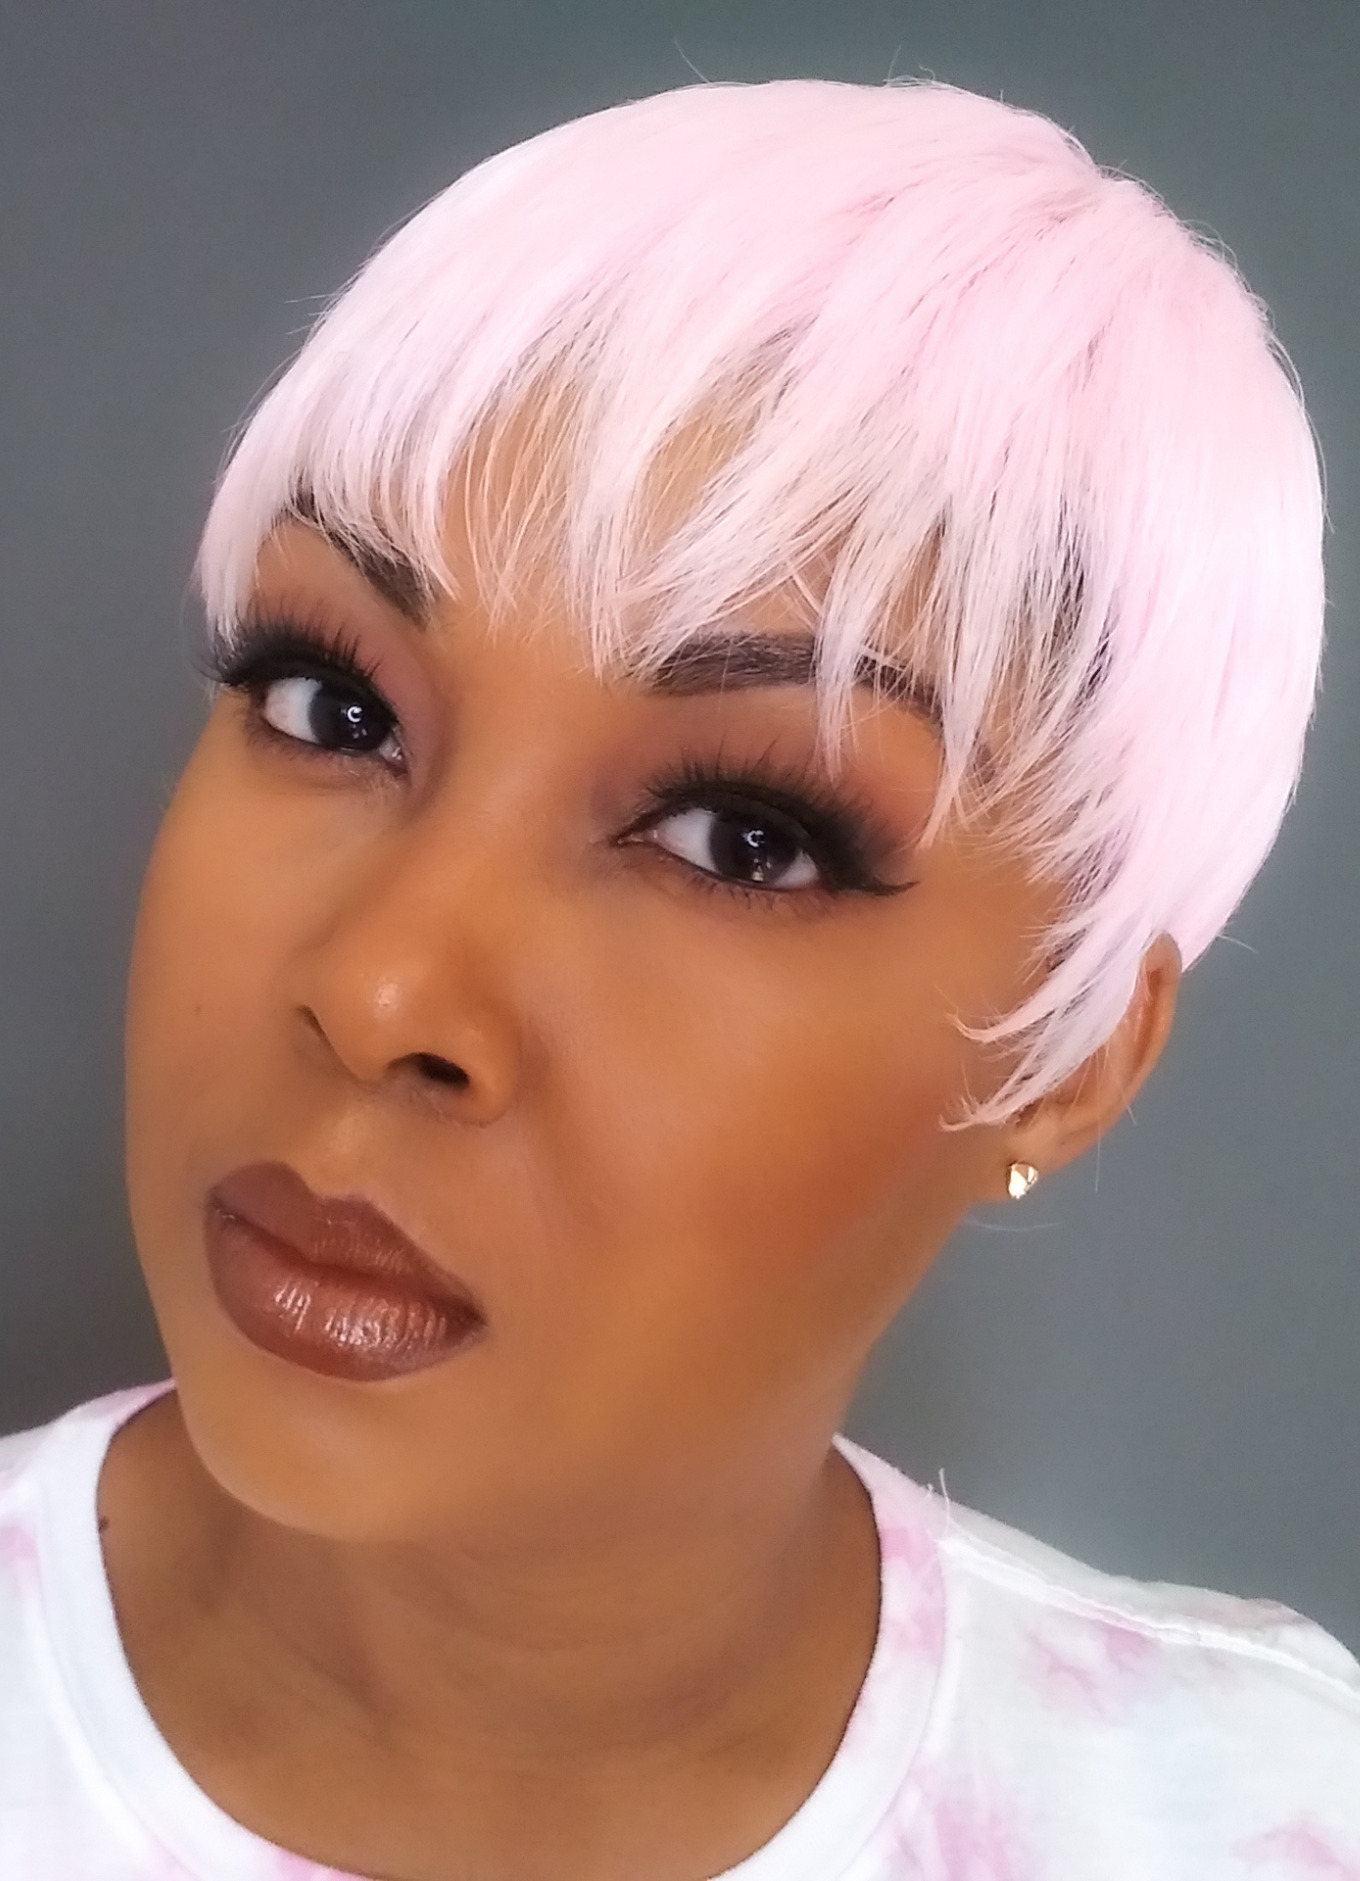 light skinned black woman wearing pink pixie wig